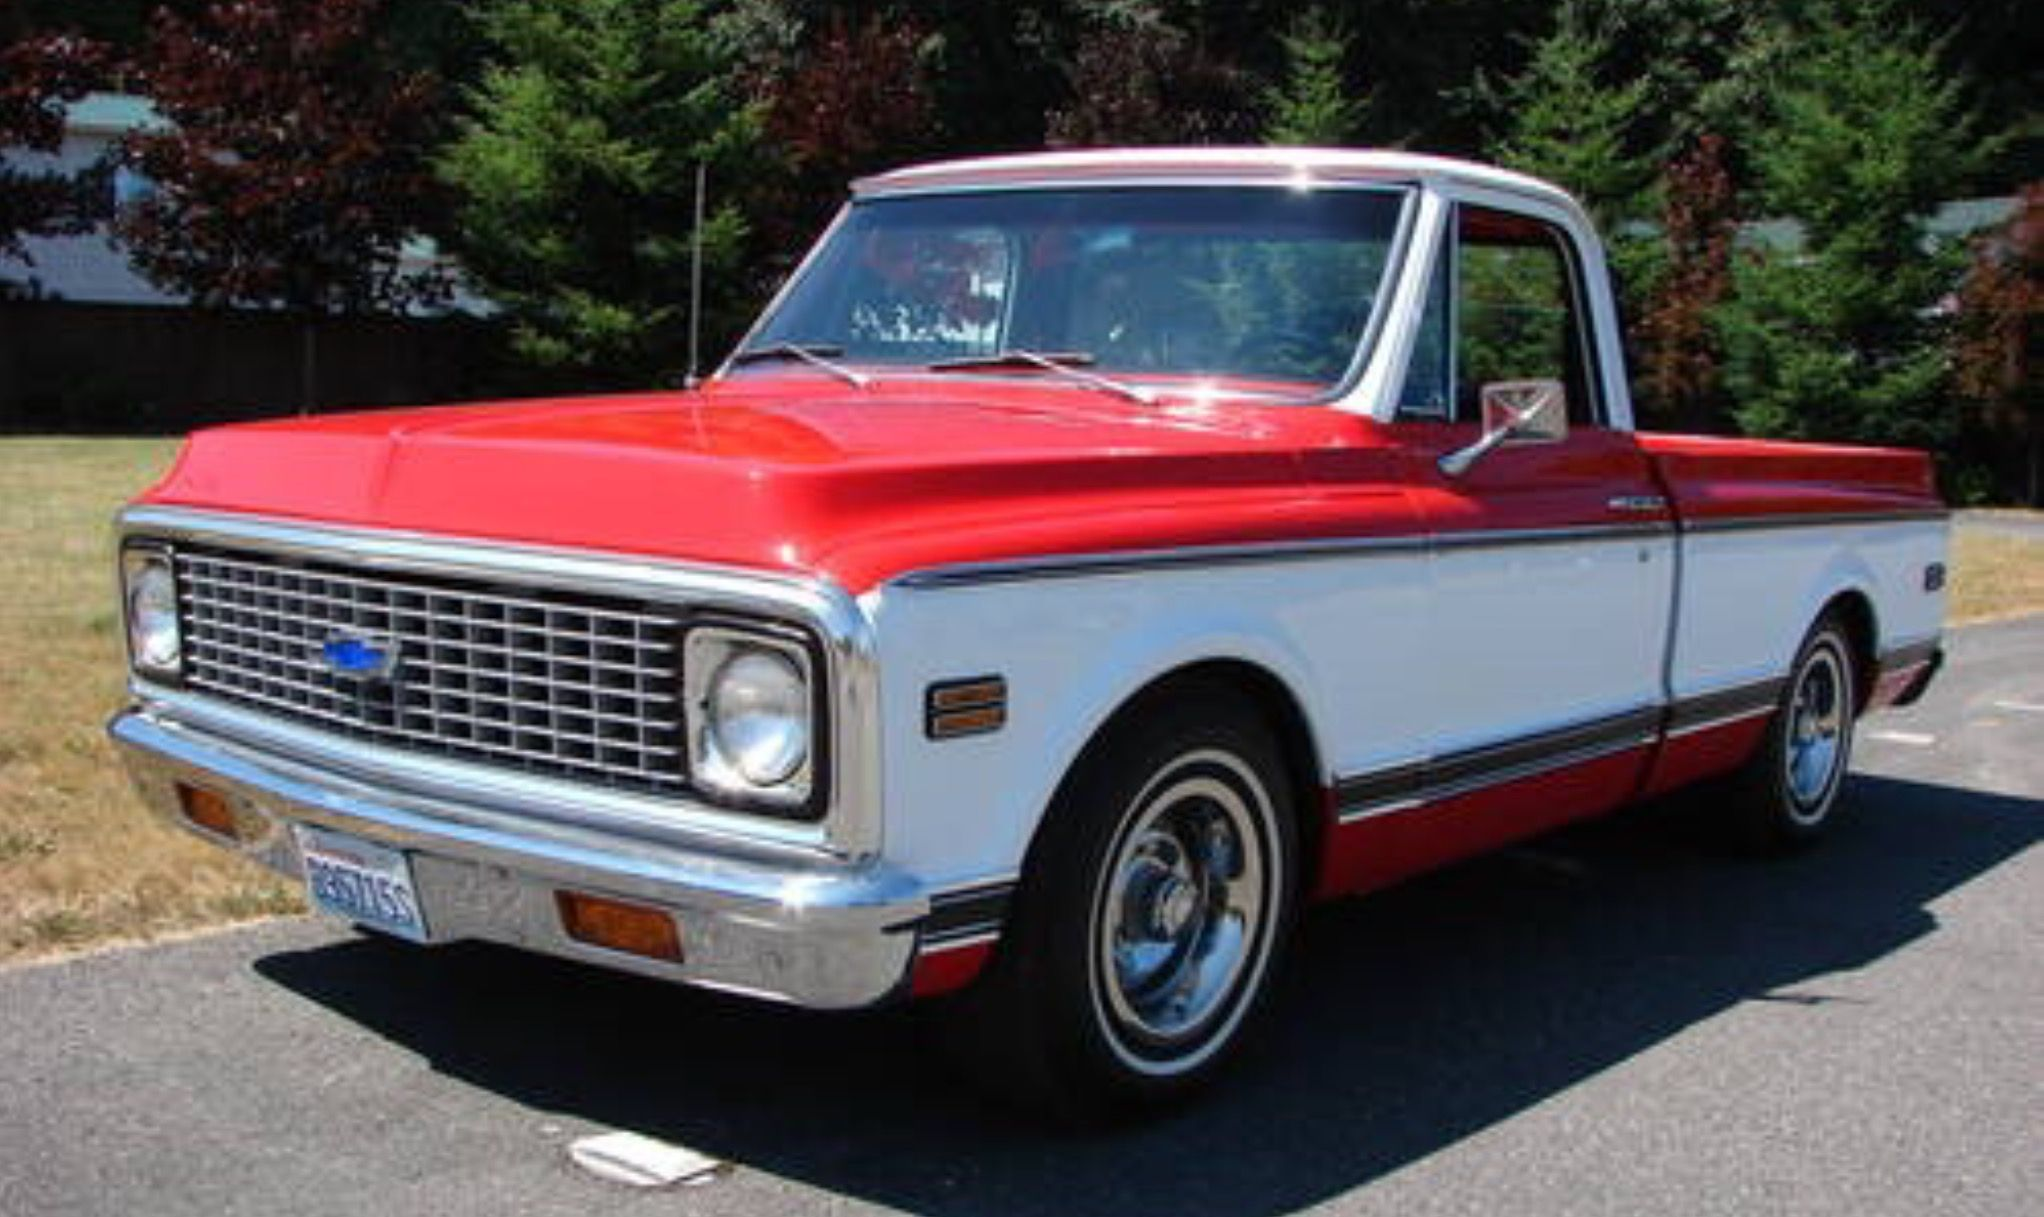 Pin by Tim on 1960 - 1972 Chevy trucks | Pinterest